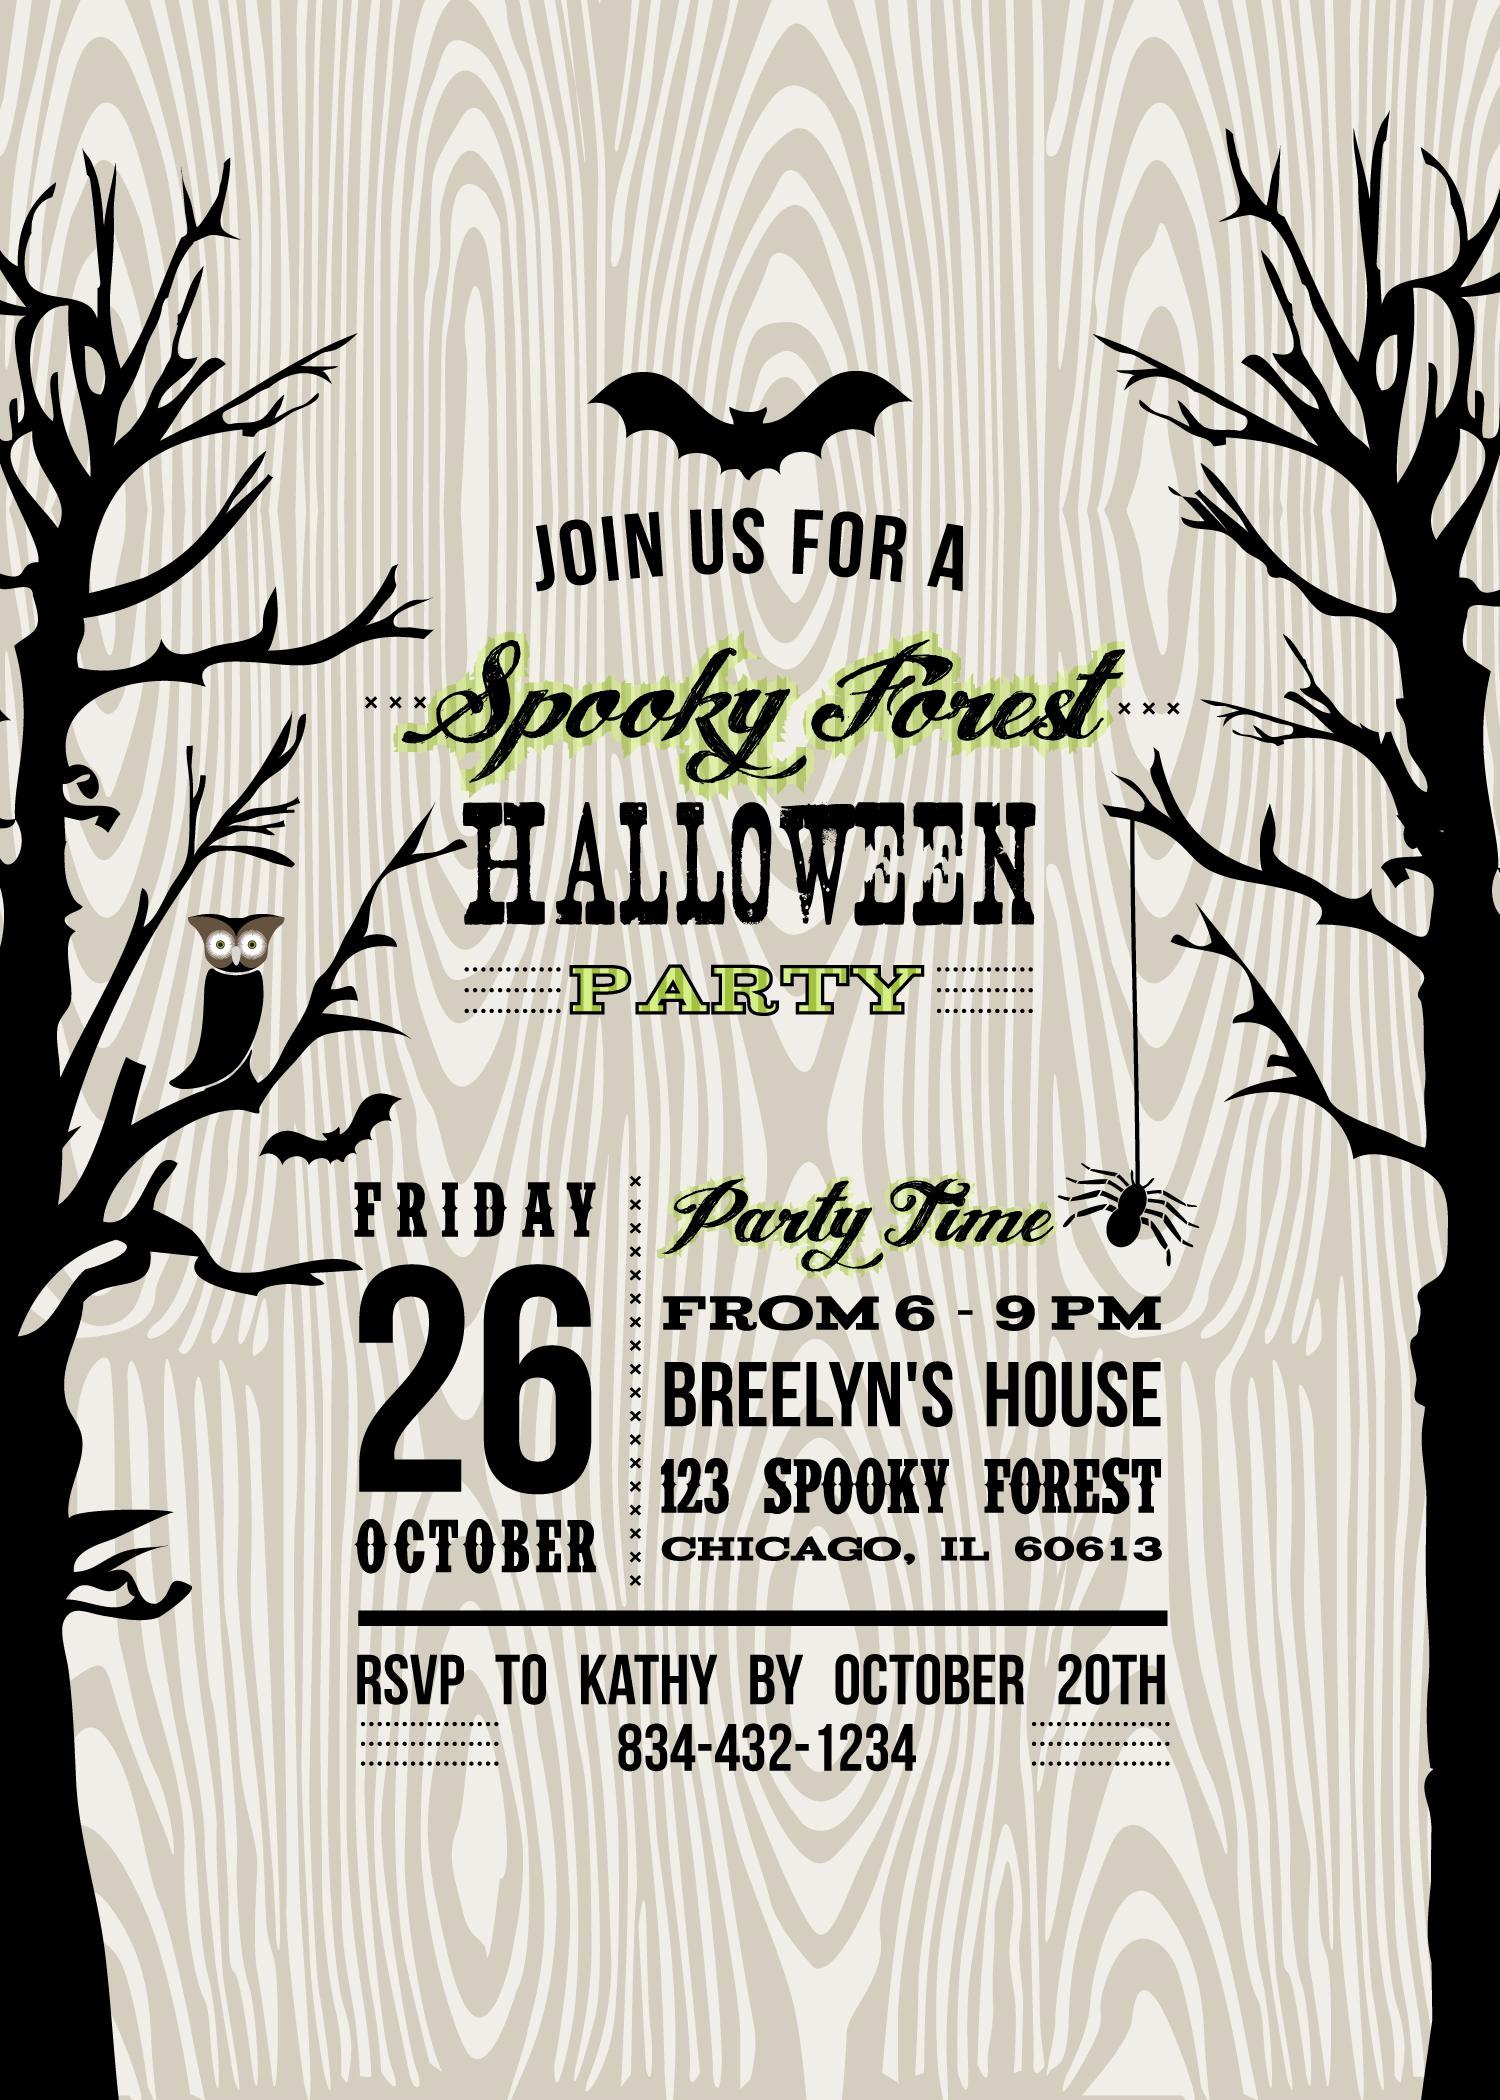 Halloween Party Invitation Template Fresh Halloween Invitation Wording byob – Festival Collections